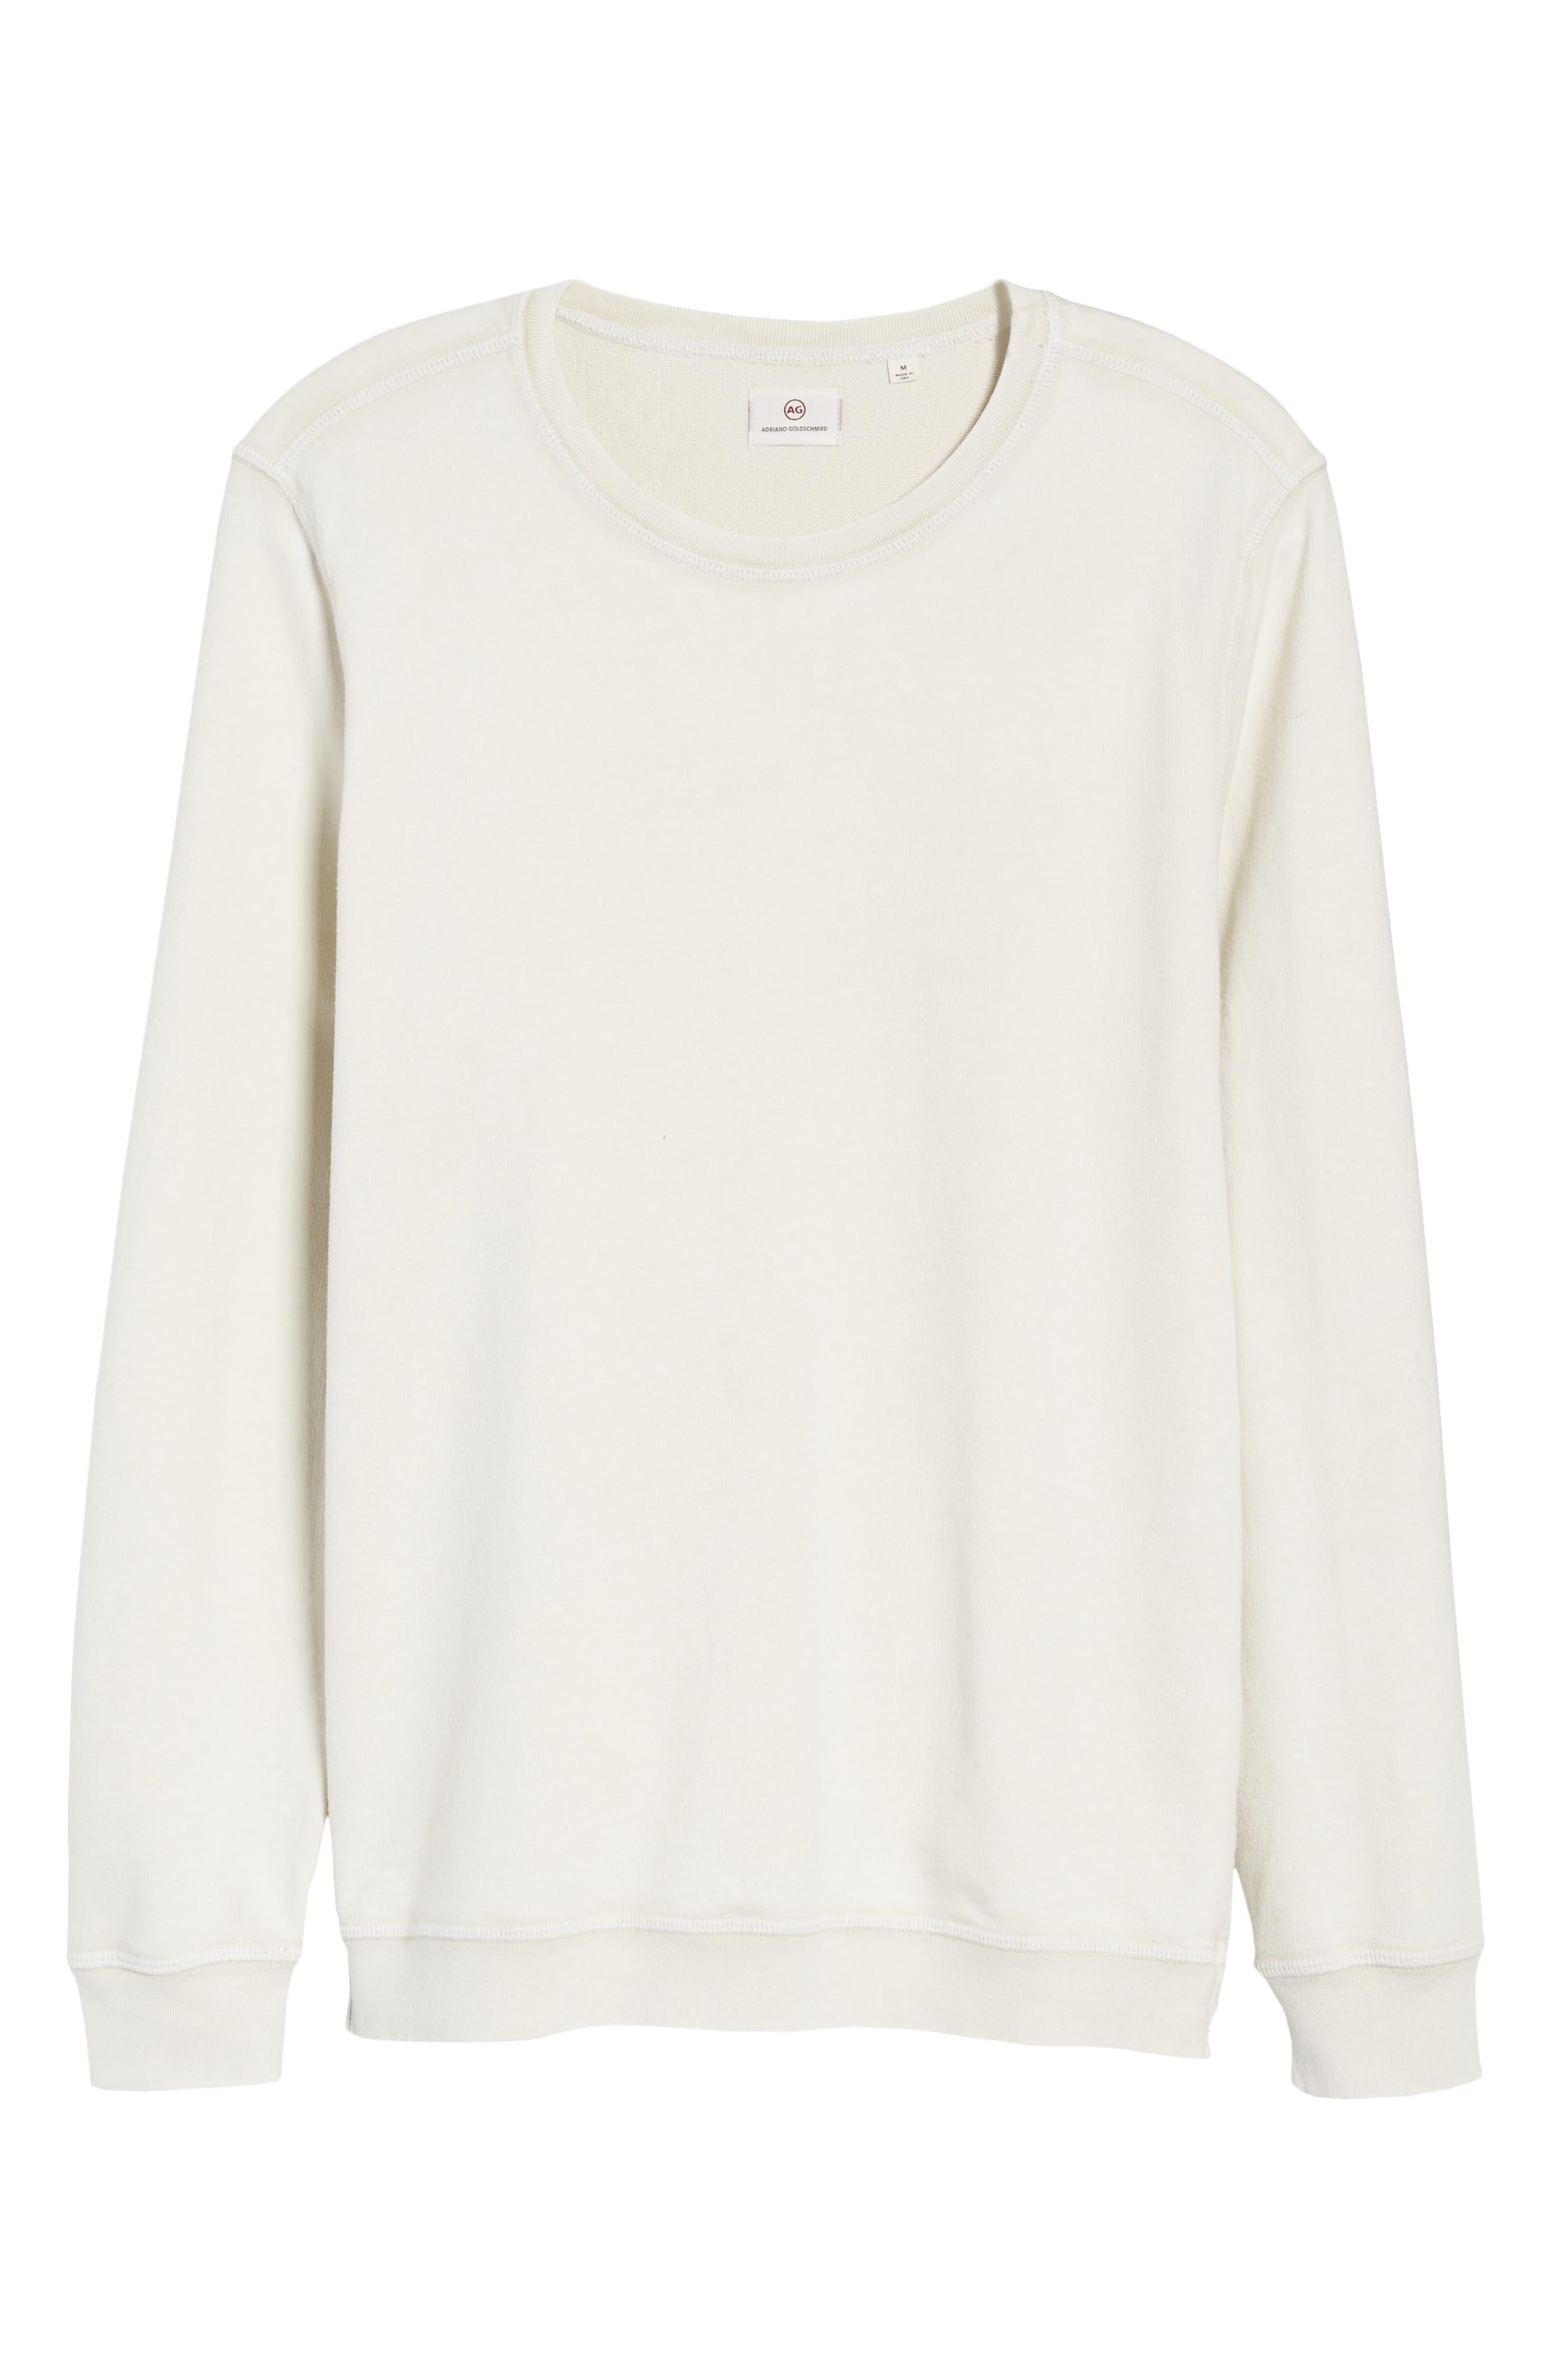 Max Slim Long Sleeve T-Shirt,                             Alternate thumbnail 6, color,